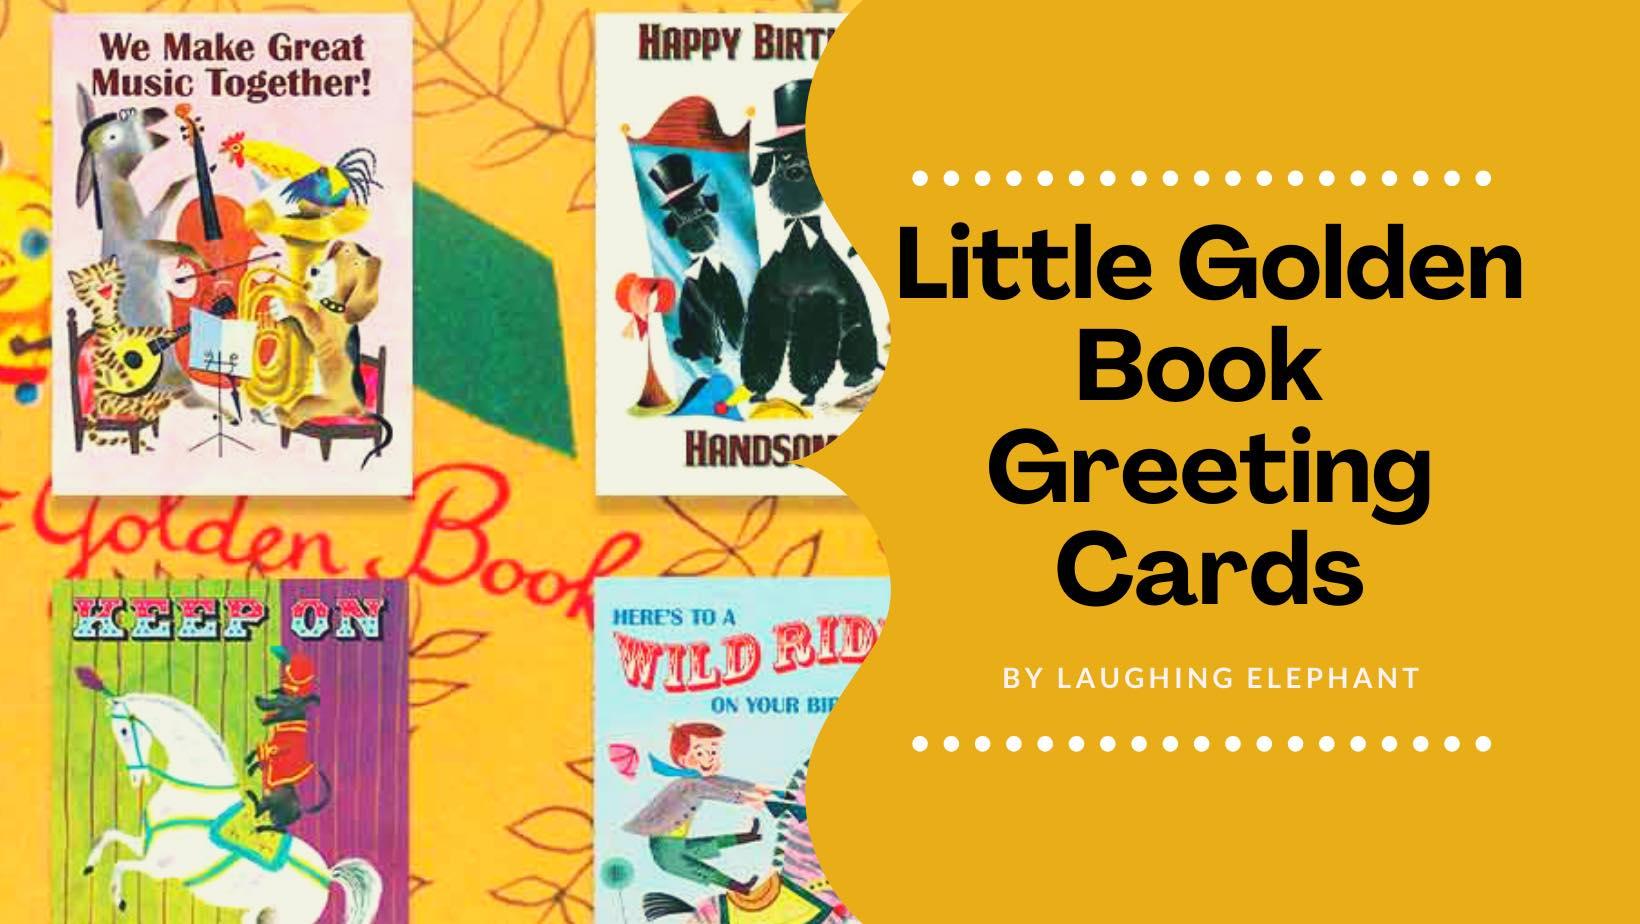 Little Golden Book Greeting Cards